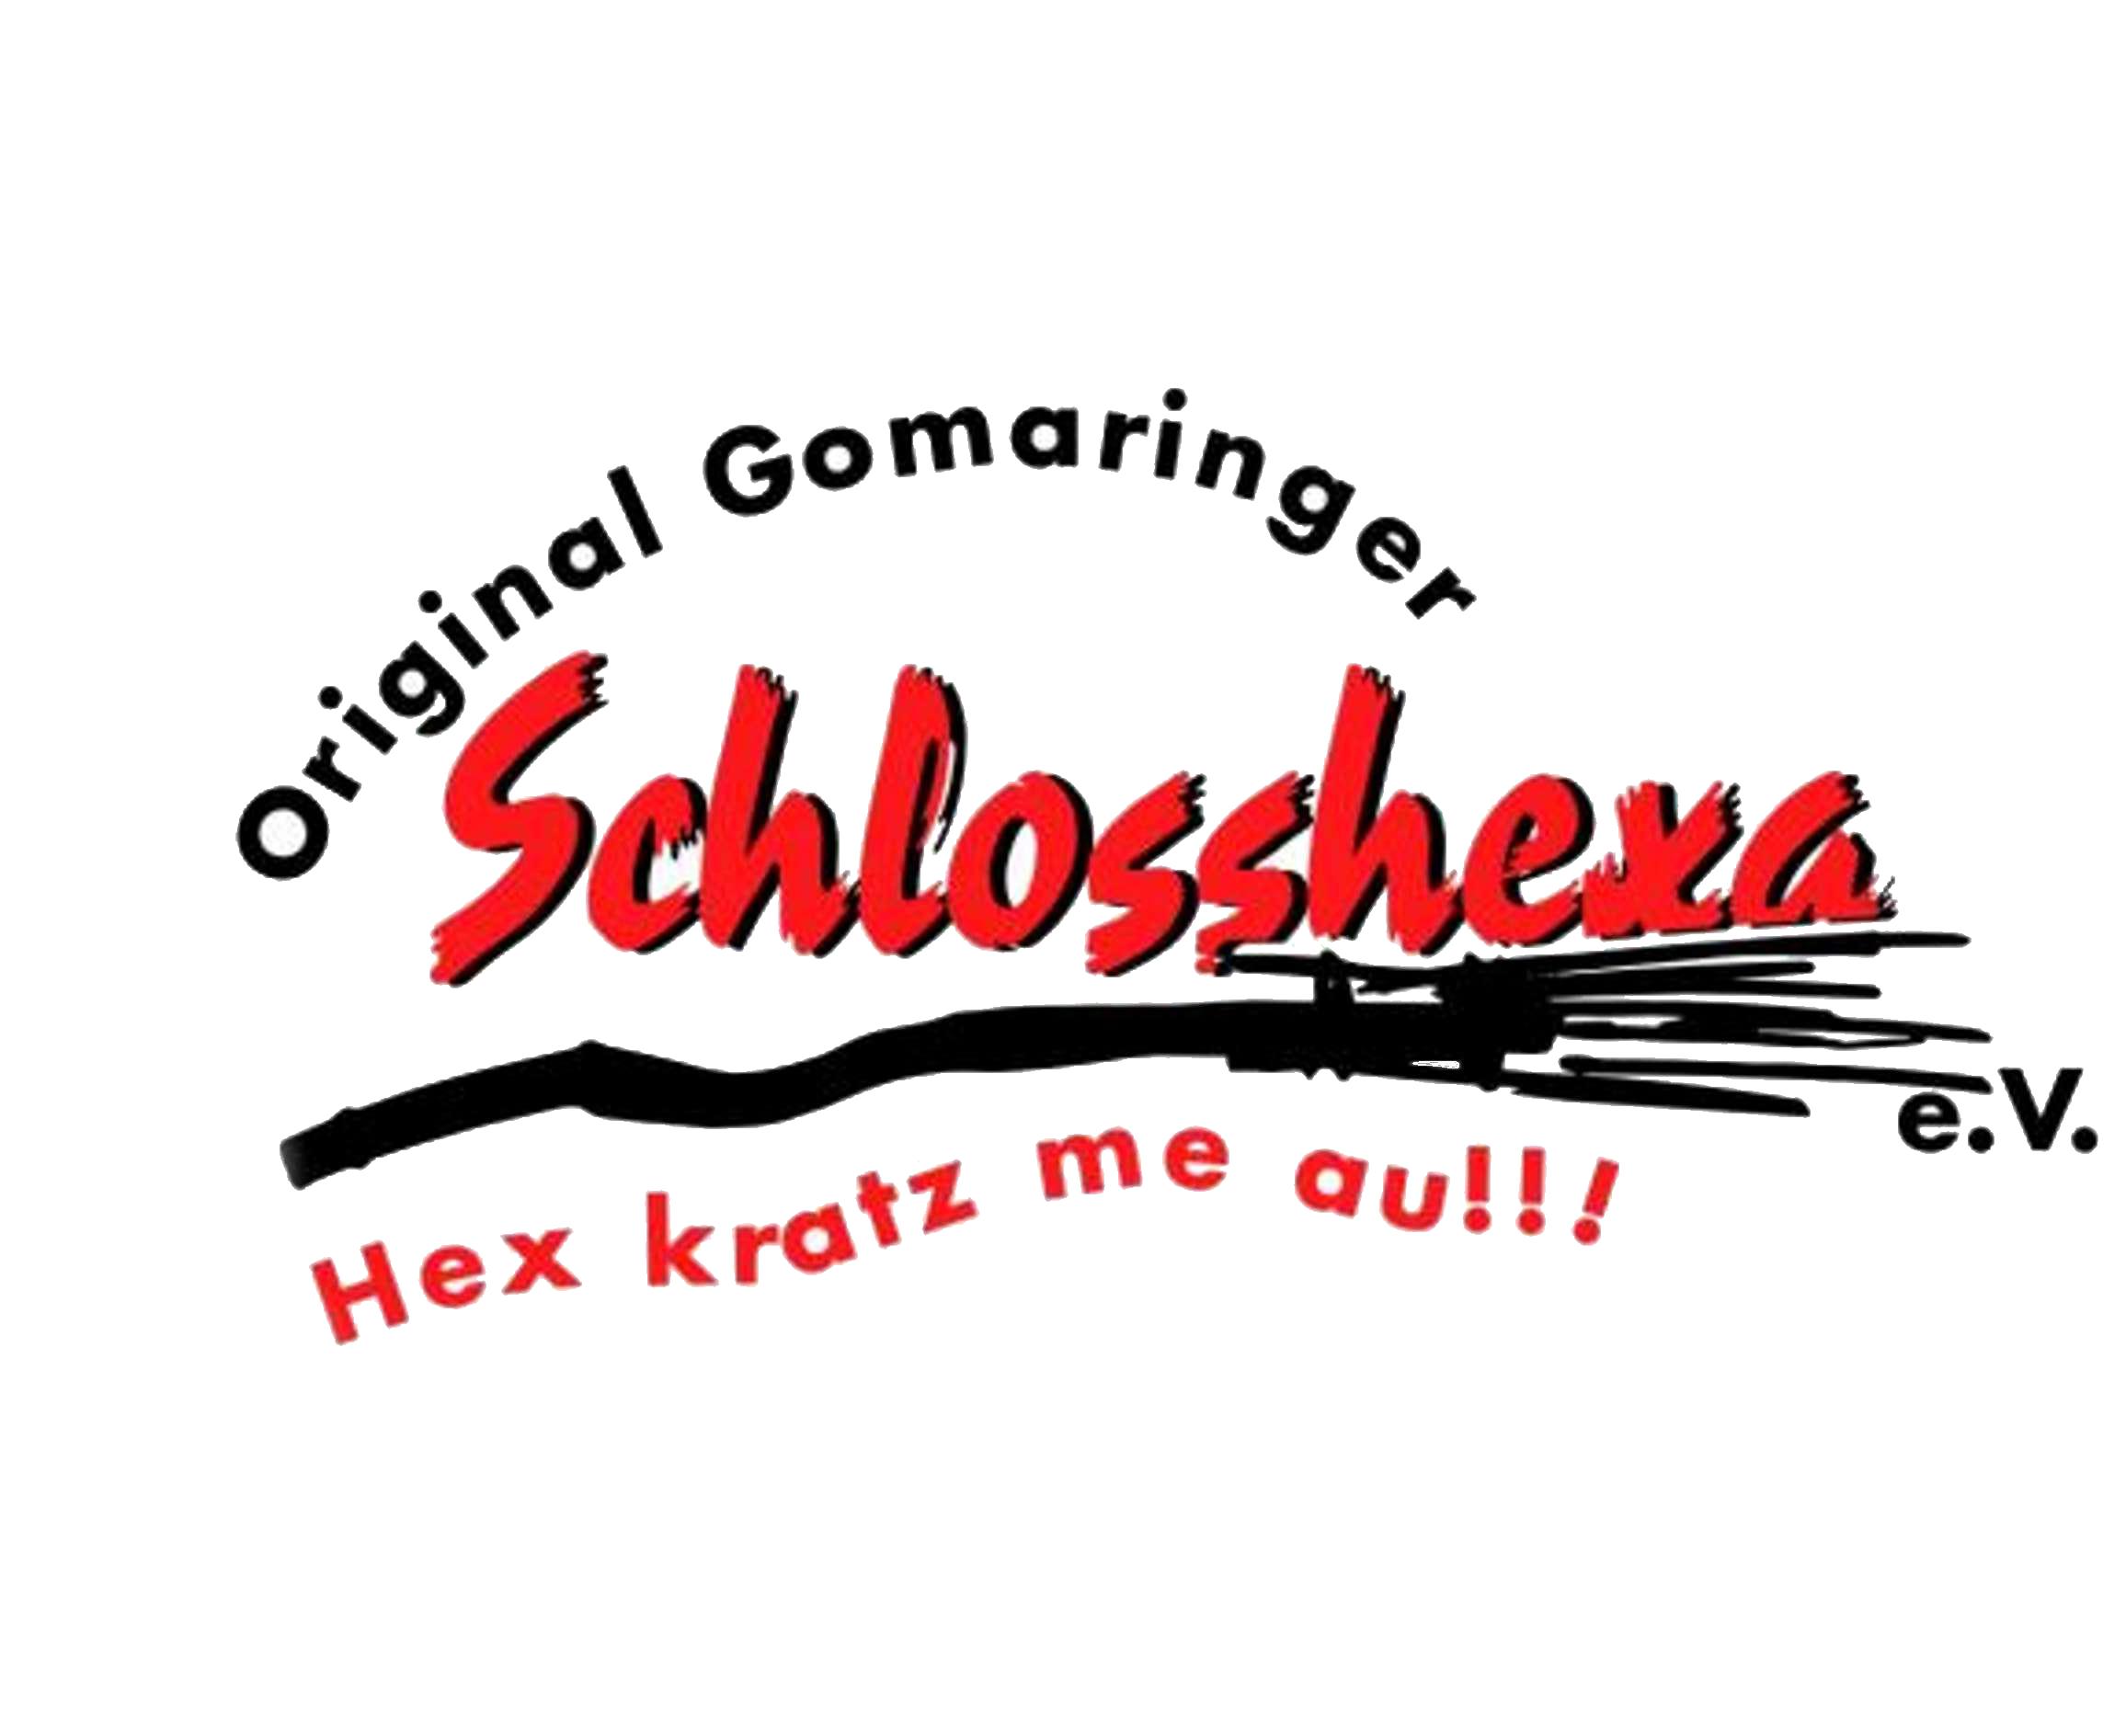 Original Gomaringer Schlosshexa e.V.